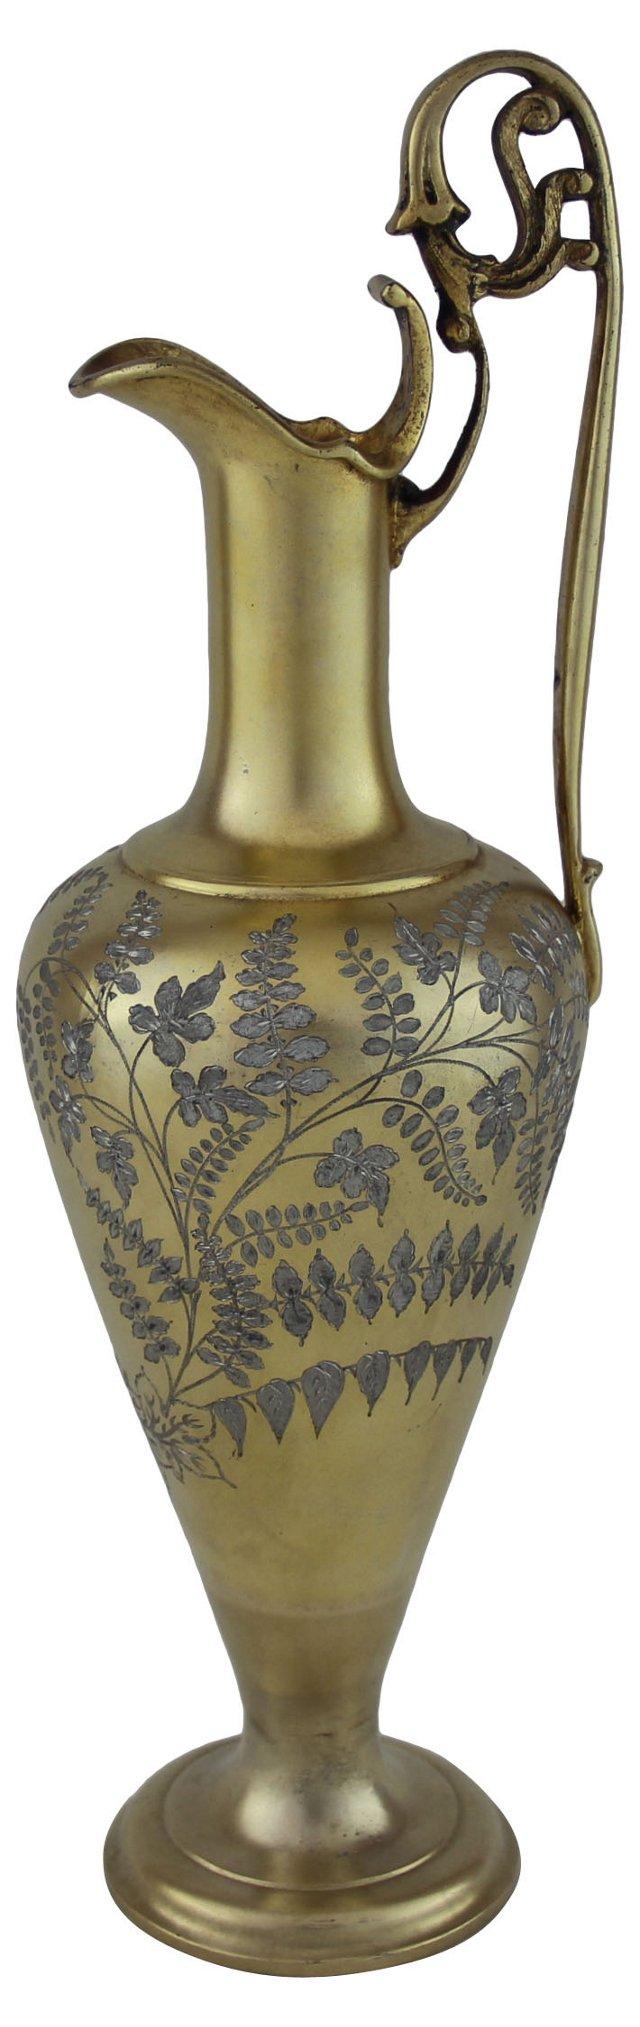 English Gold Vermeil Ewer, C. 1860